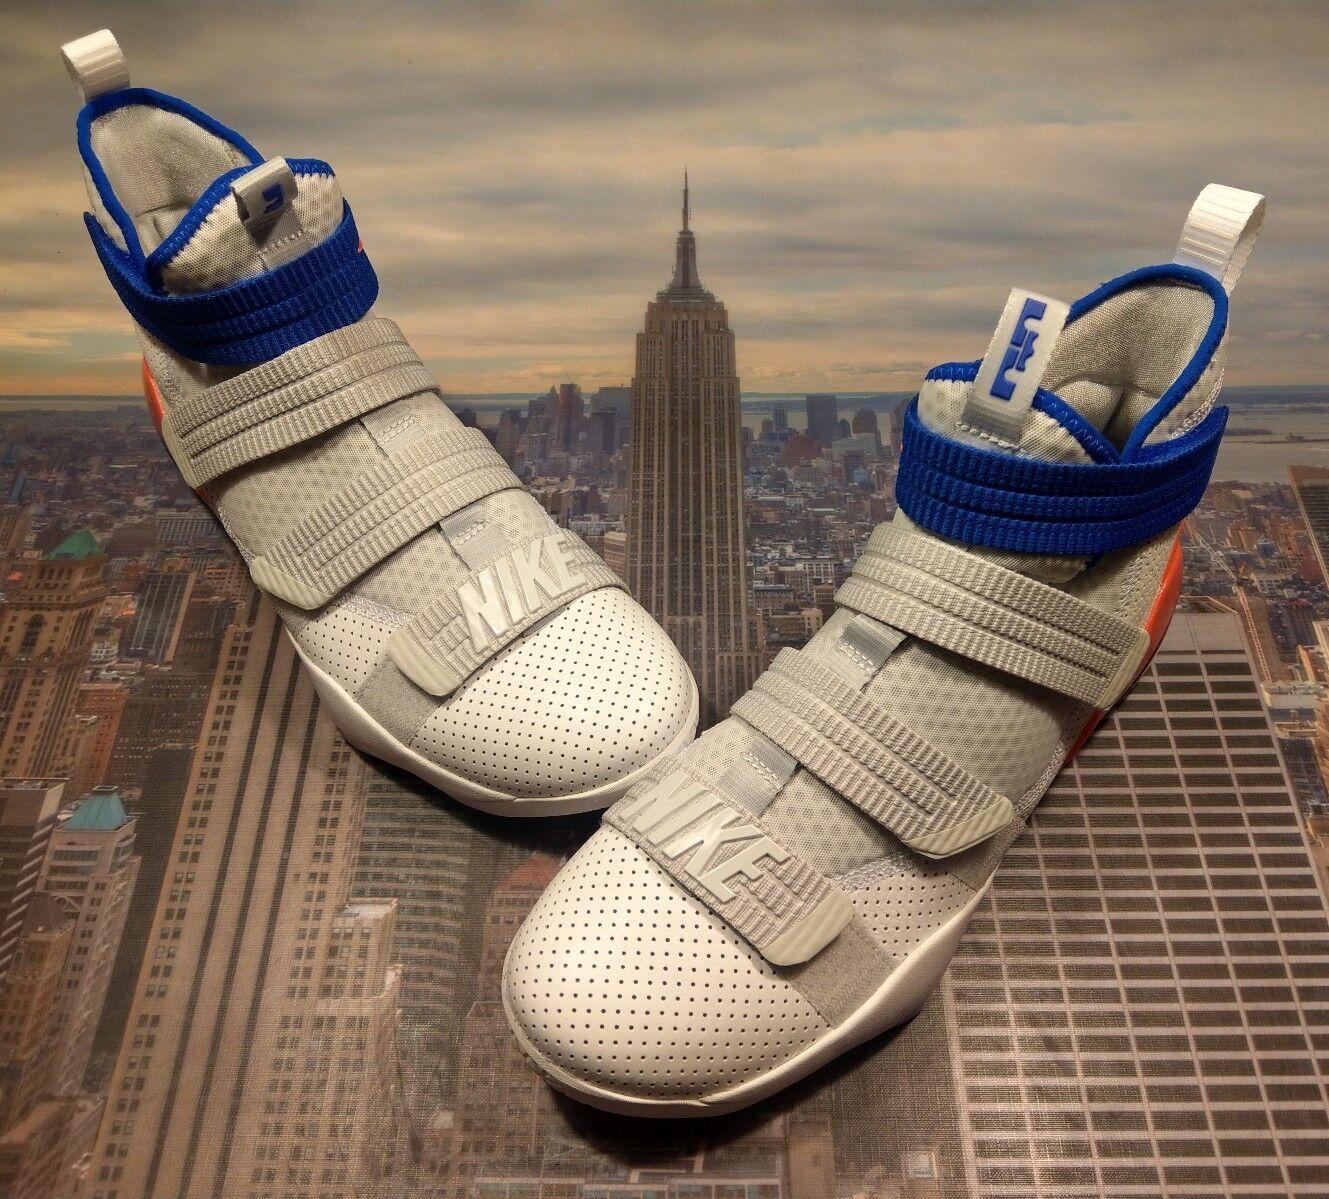 Nike LeBron Soldier XI 11 Size SFG Ultramarine White/Racer Blue Size 11 14 897646 101 d98c68